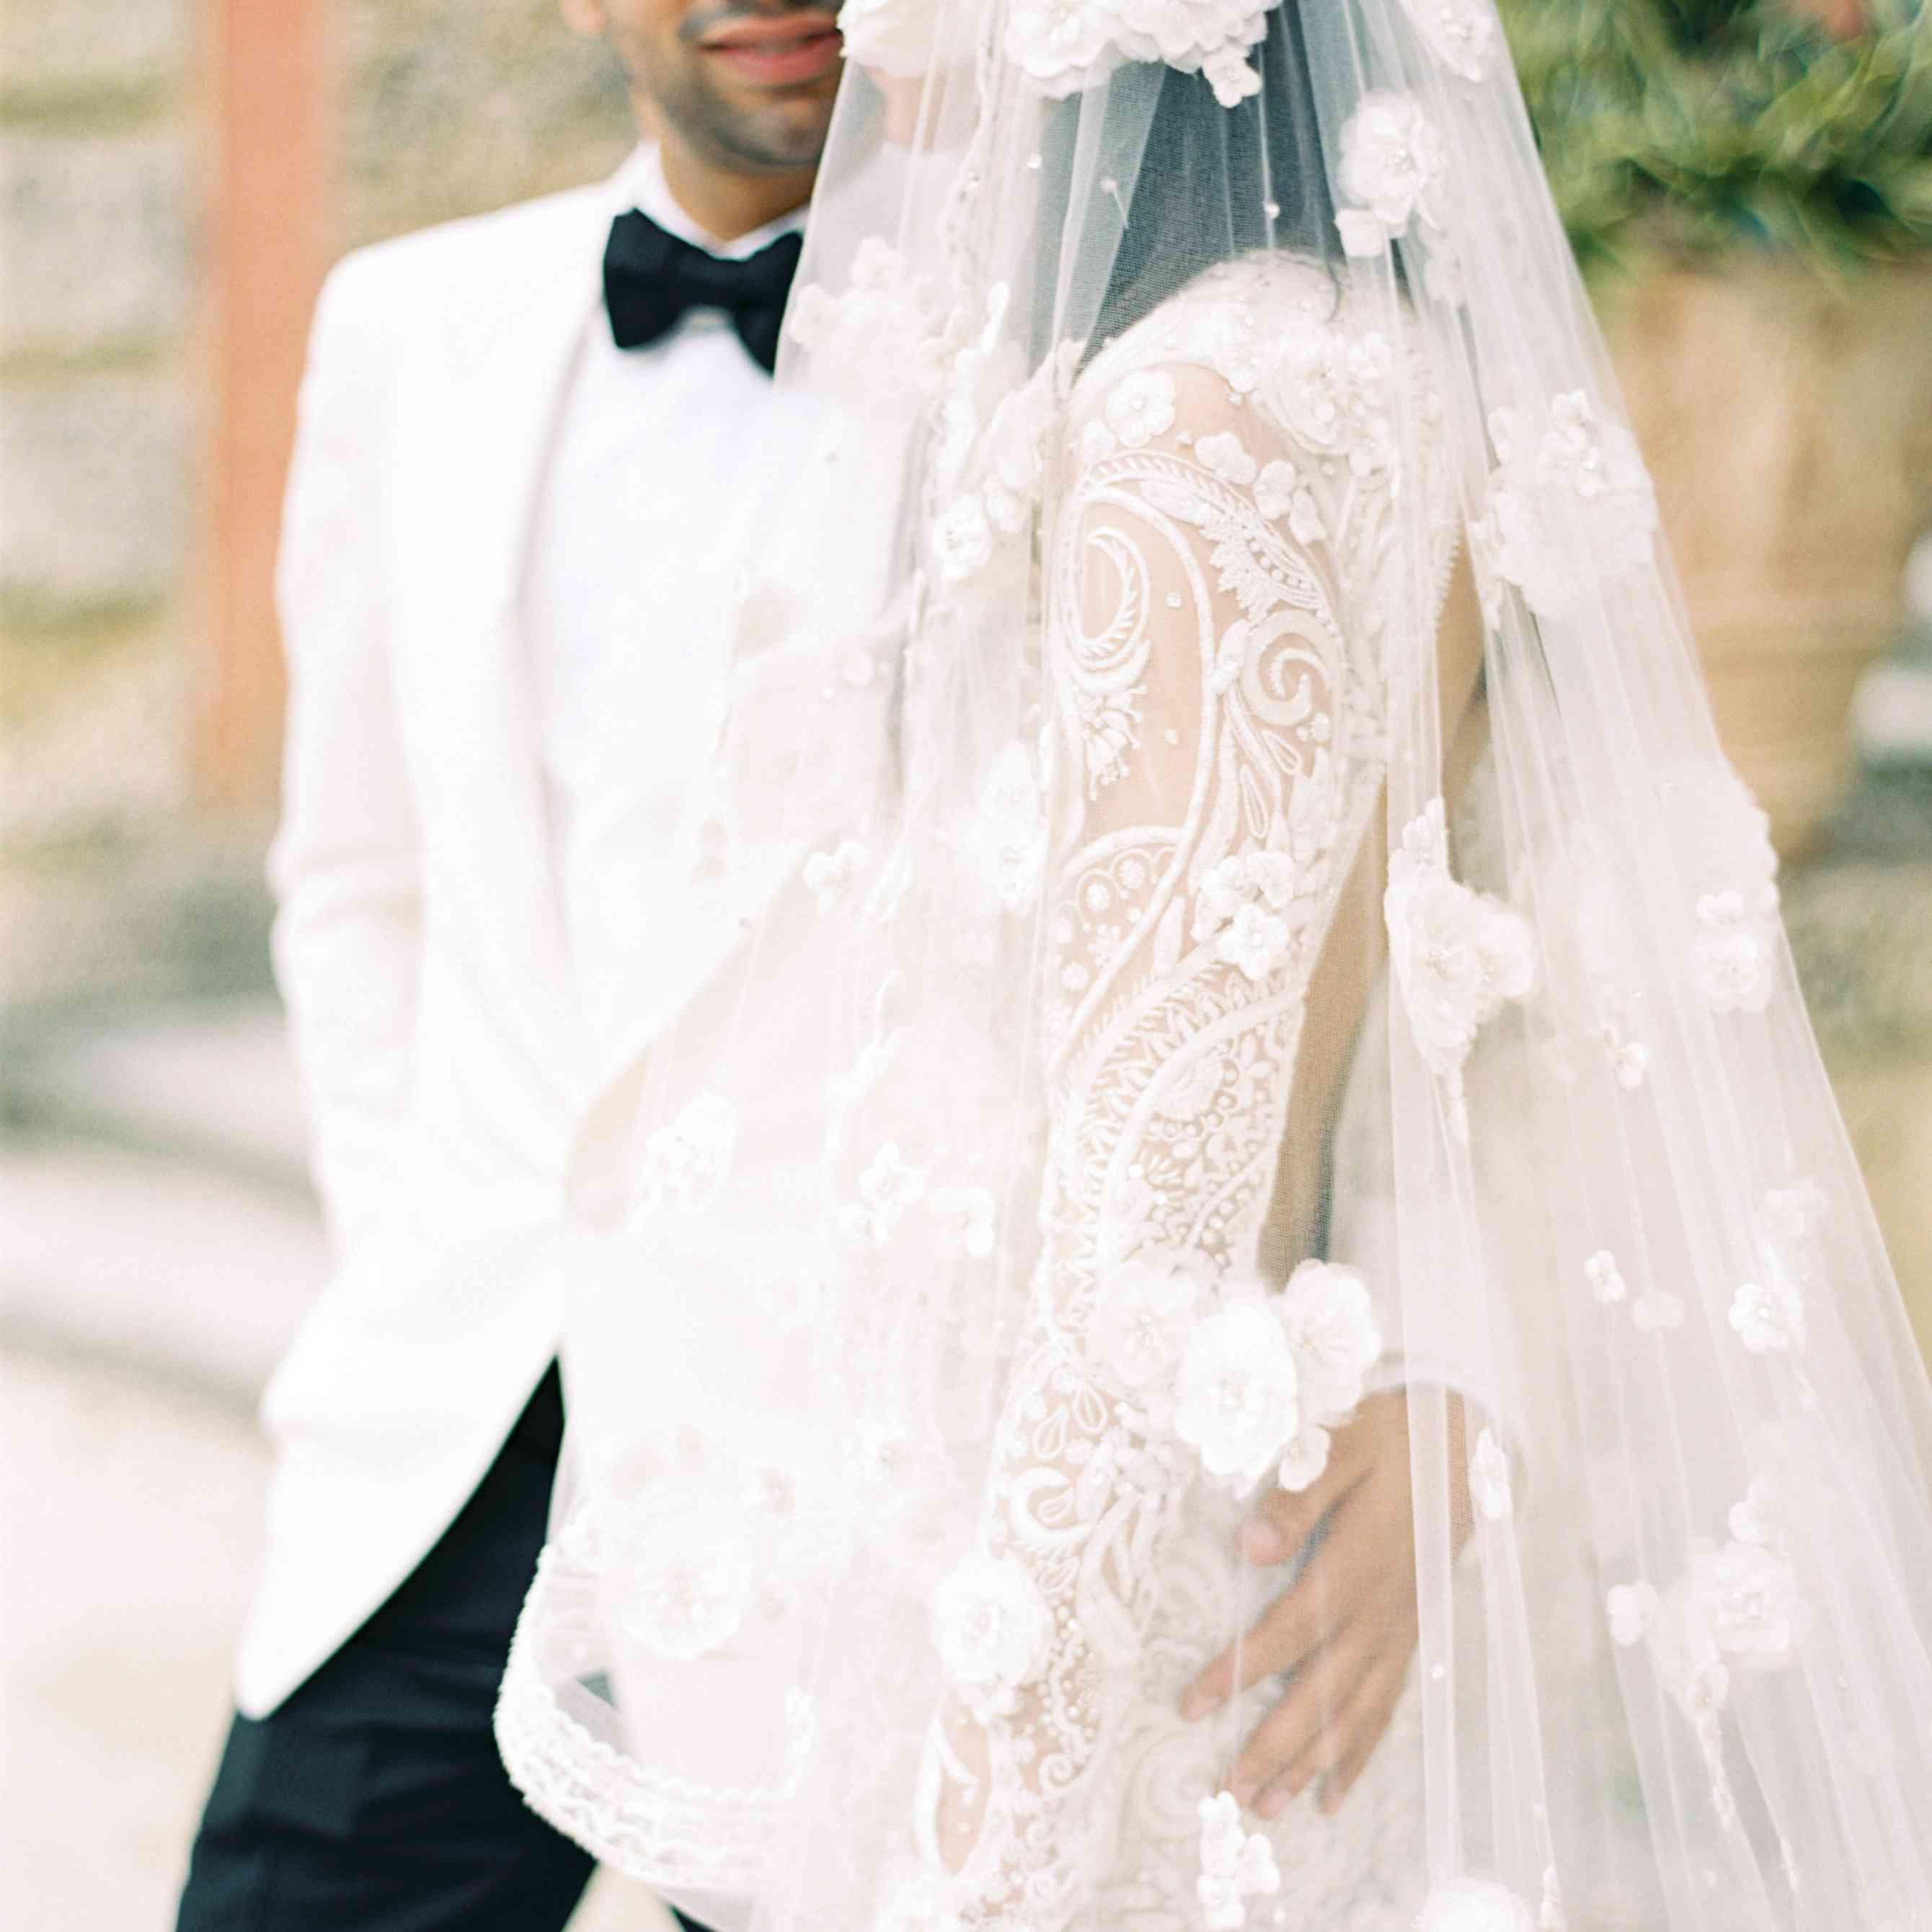 Bride in Lace Veil